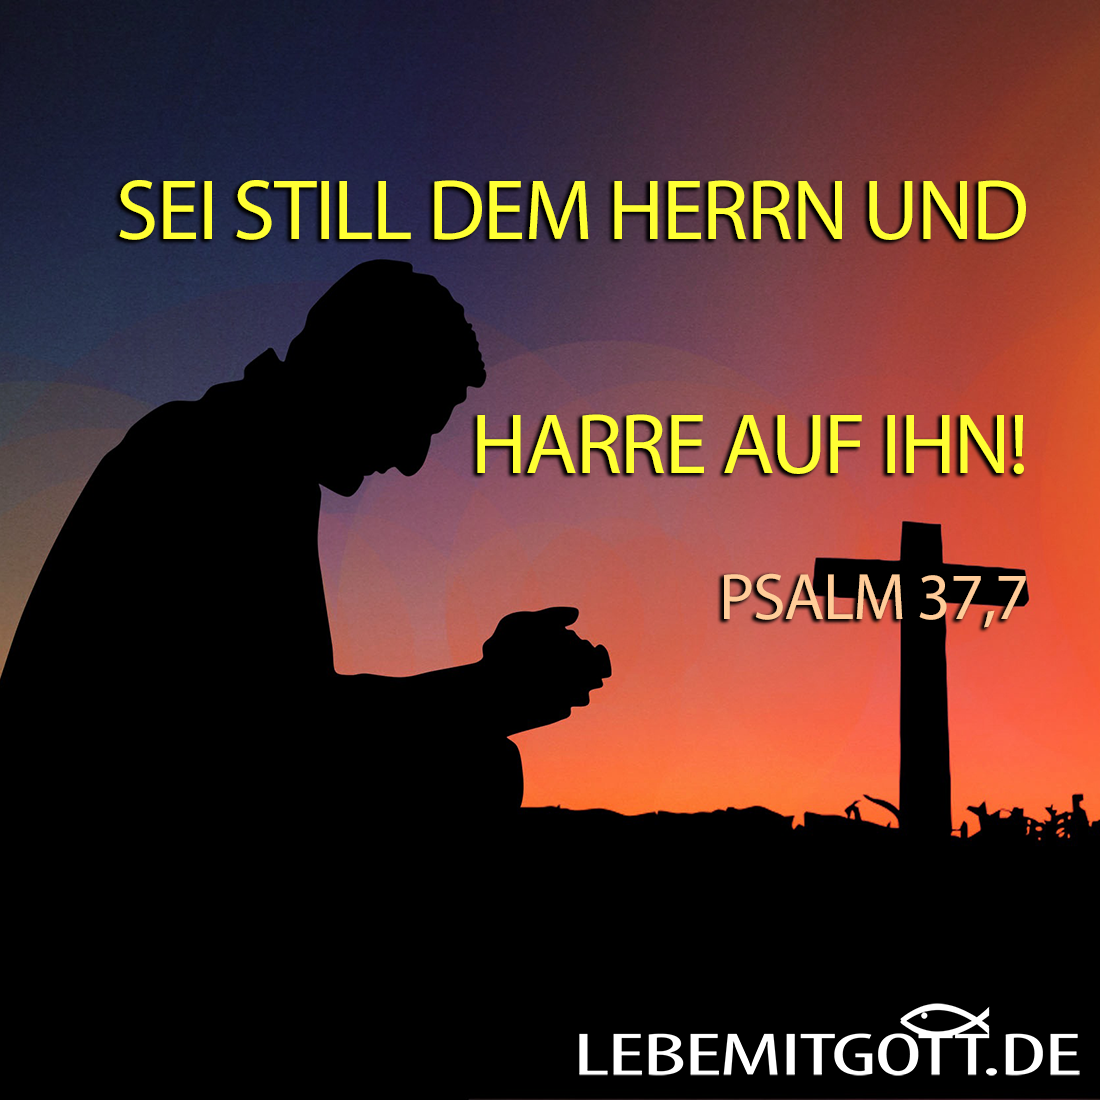 Psalm 37,7